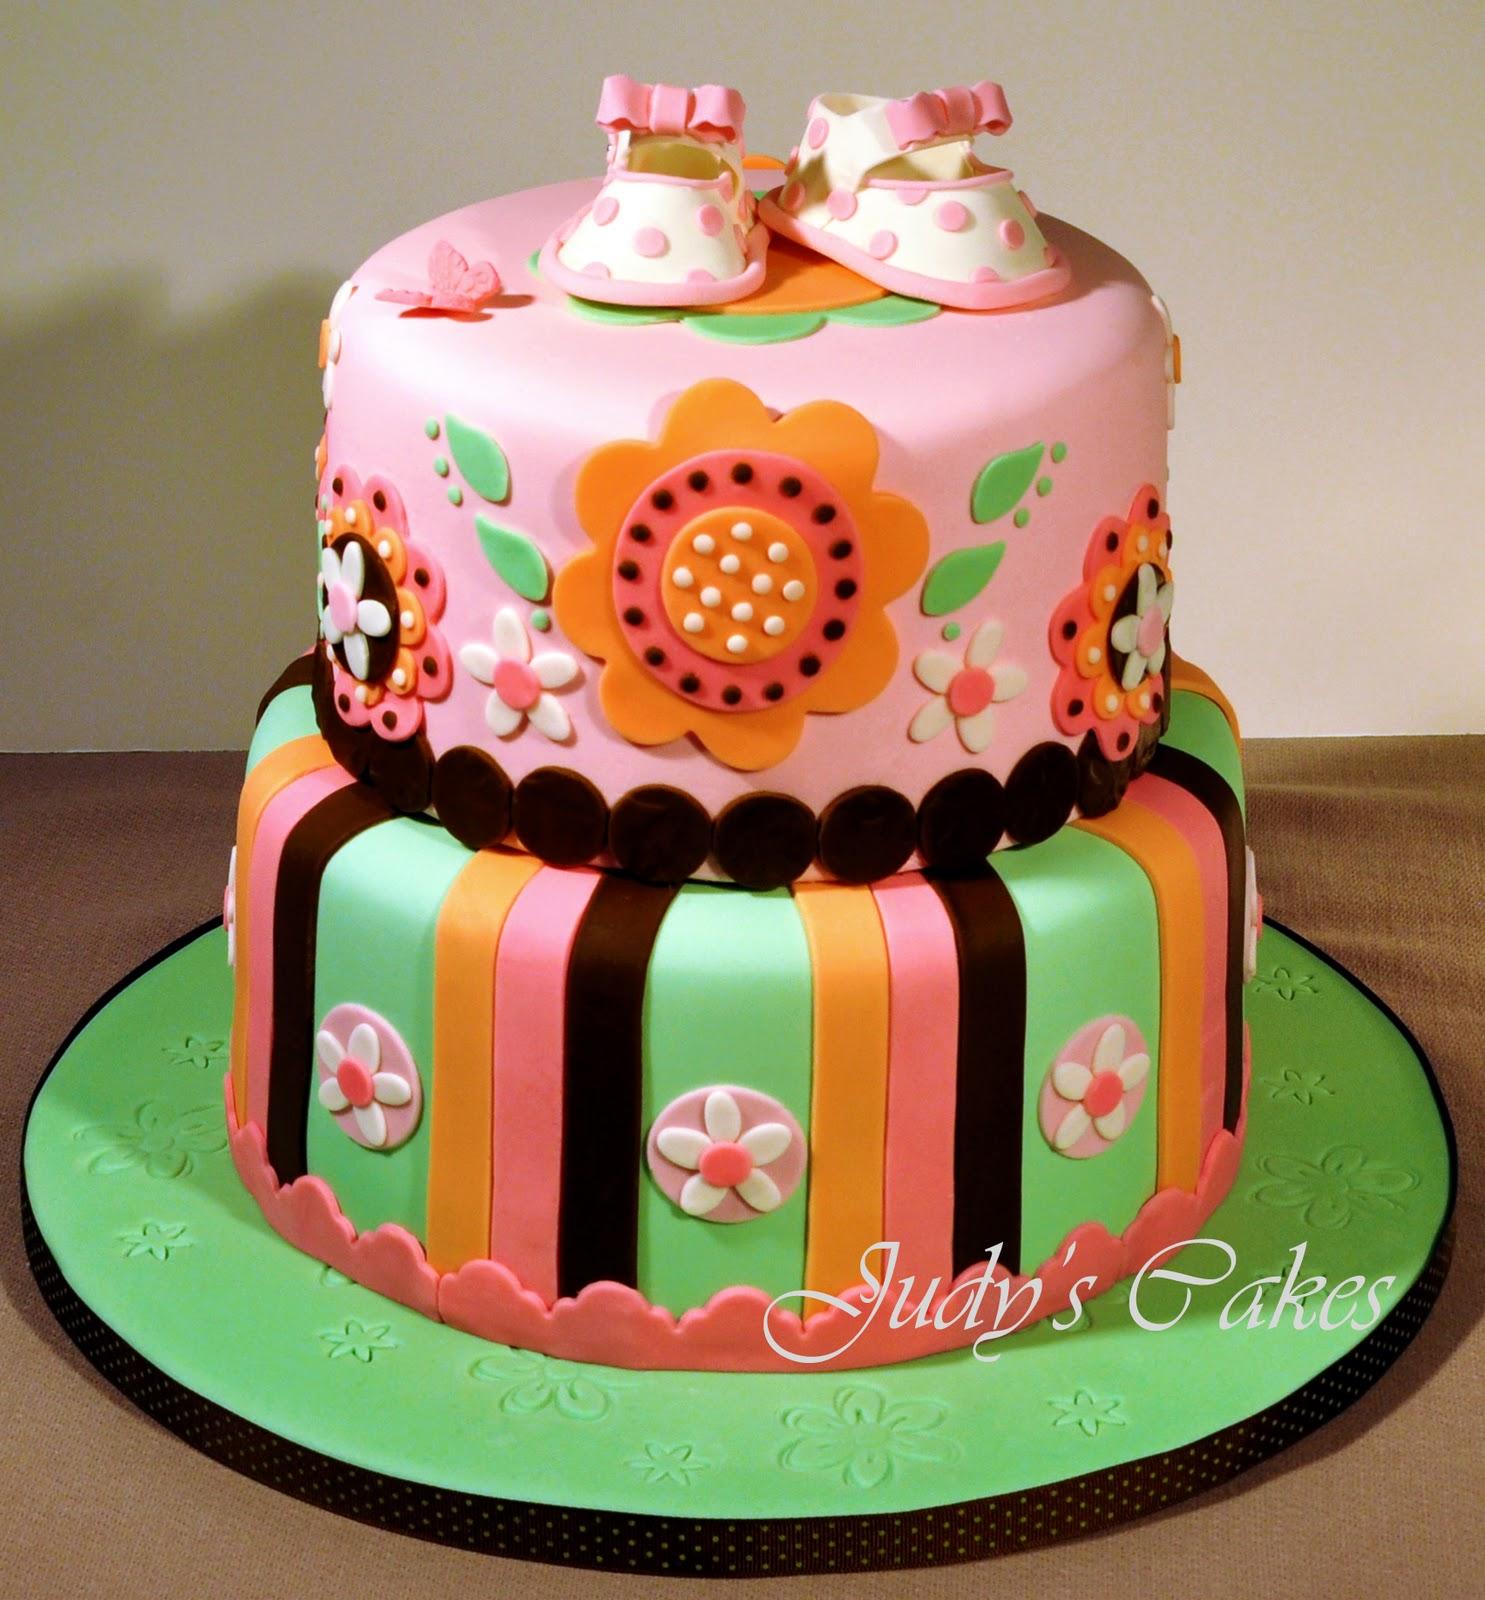 judy s cakes precious baby shower monday november 14 2011